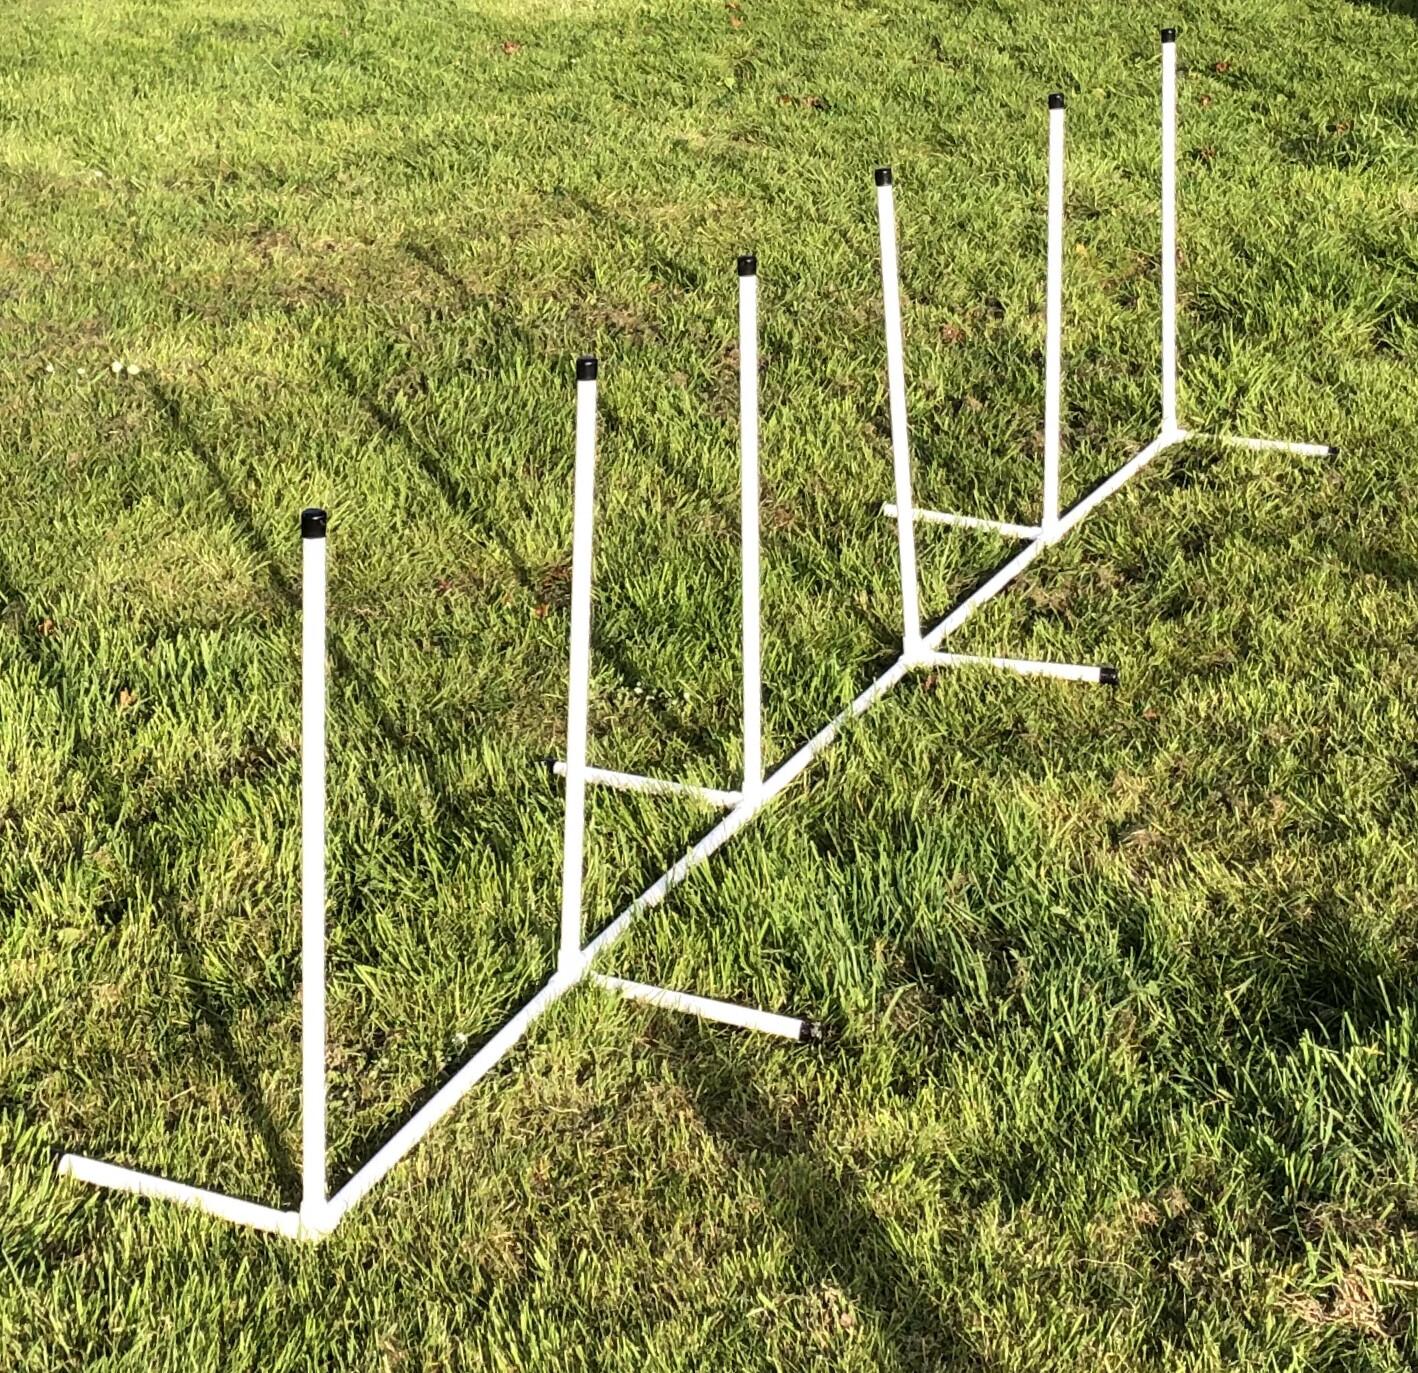 12 Weave Poles